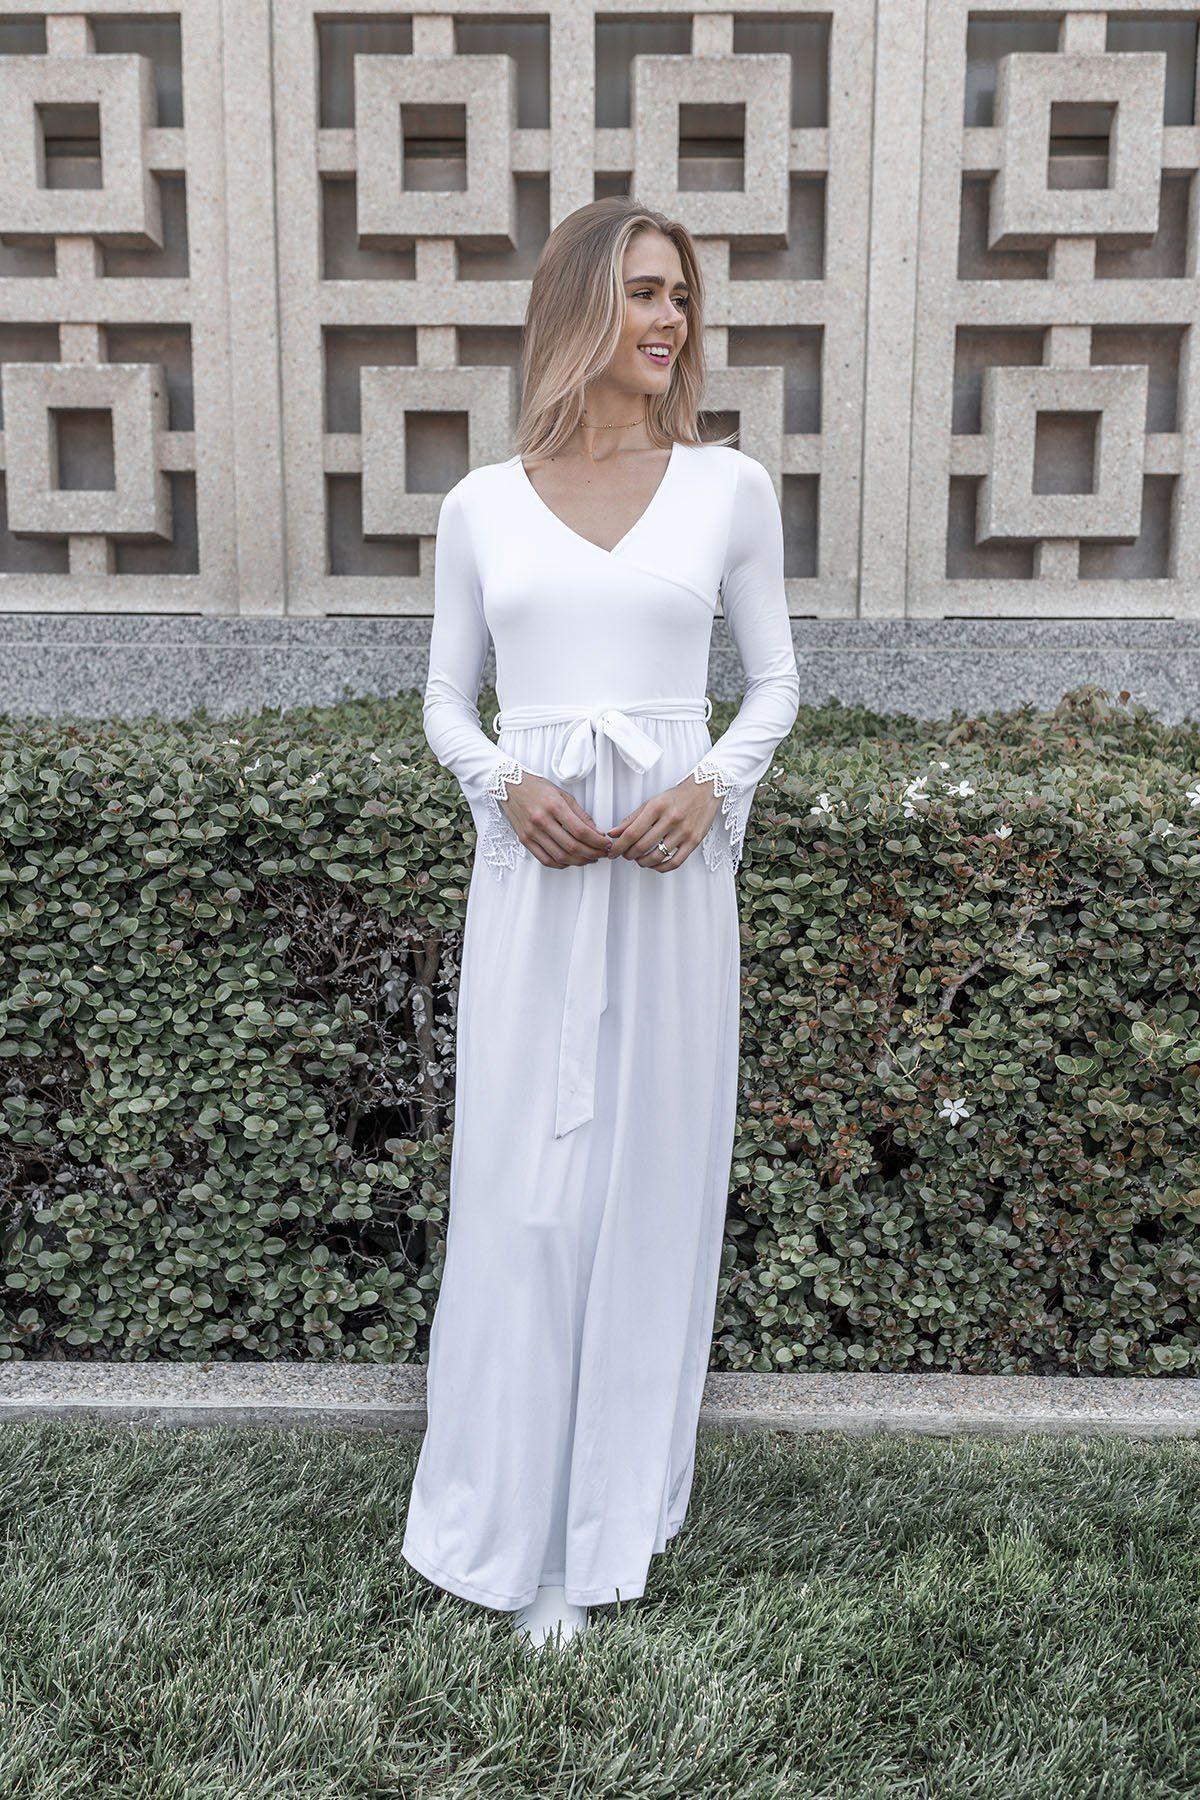 White Rose Dress Temple Dress White Dresses For Women Lds Temple Dress [ 1800 x 1200 Pixel ]